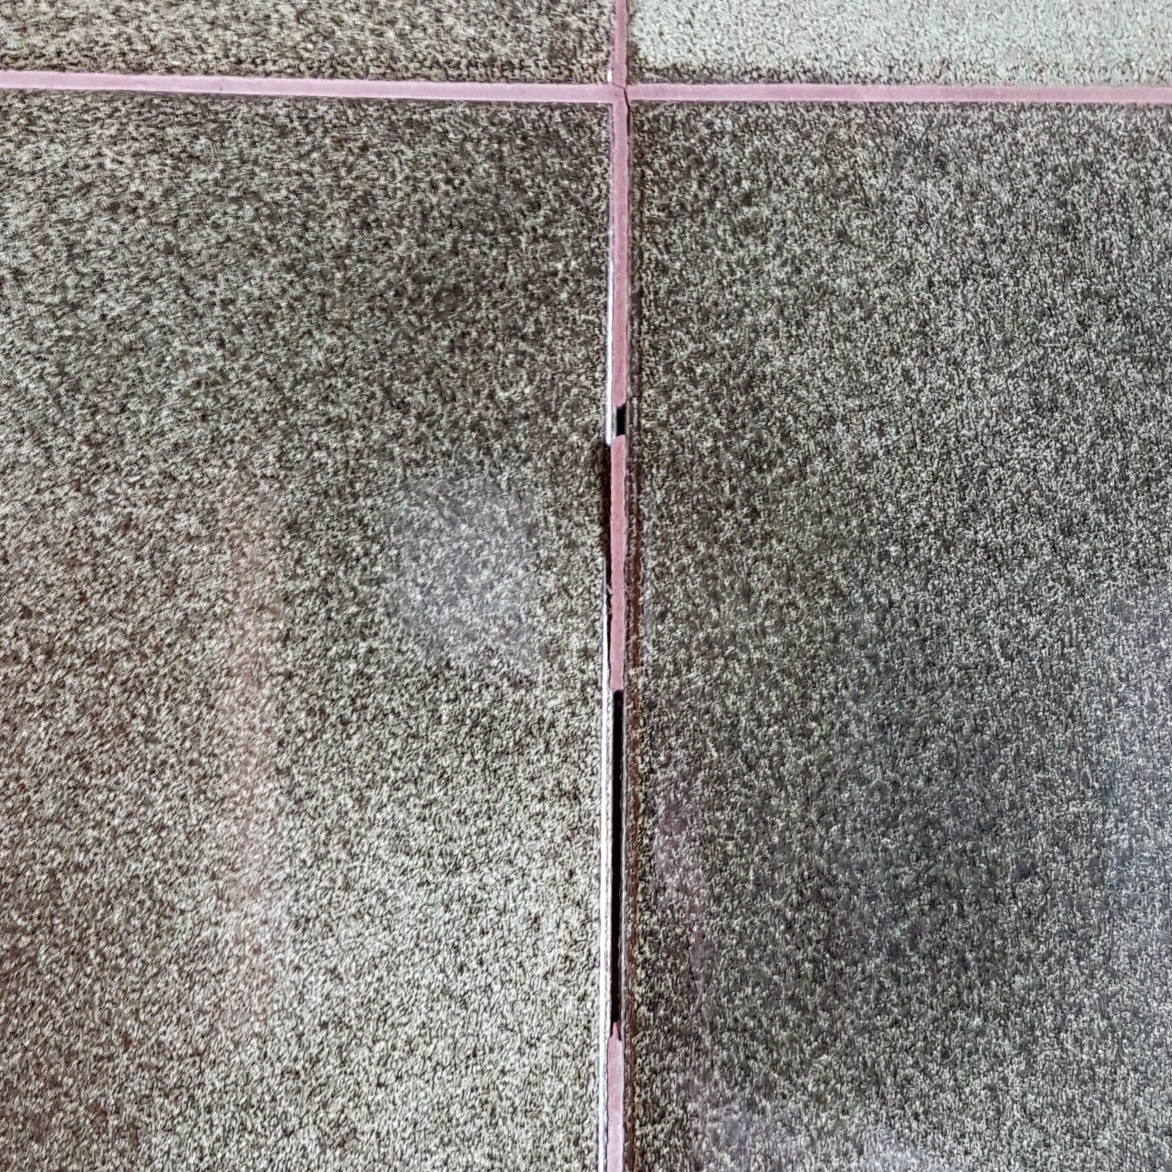 Fugenloses Bad mit Wandpaneelen - Ledo Bad